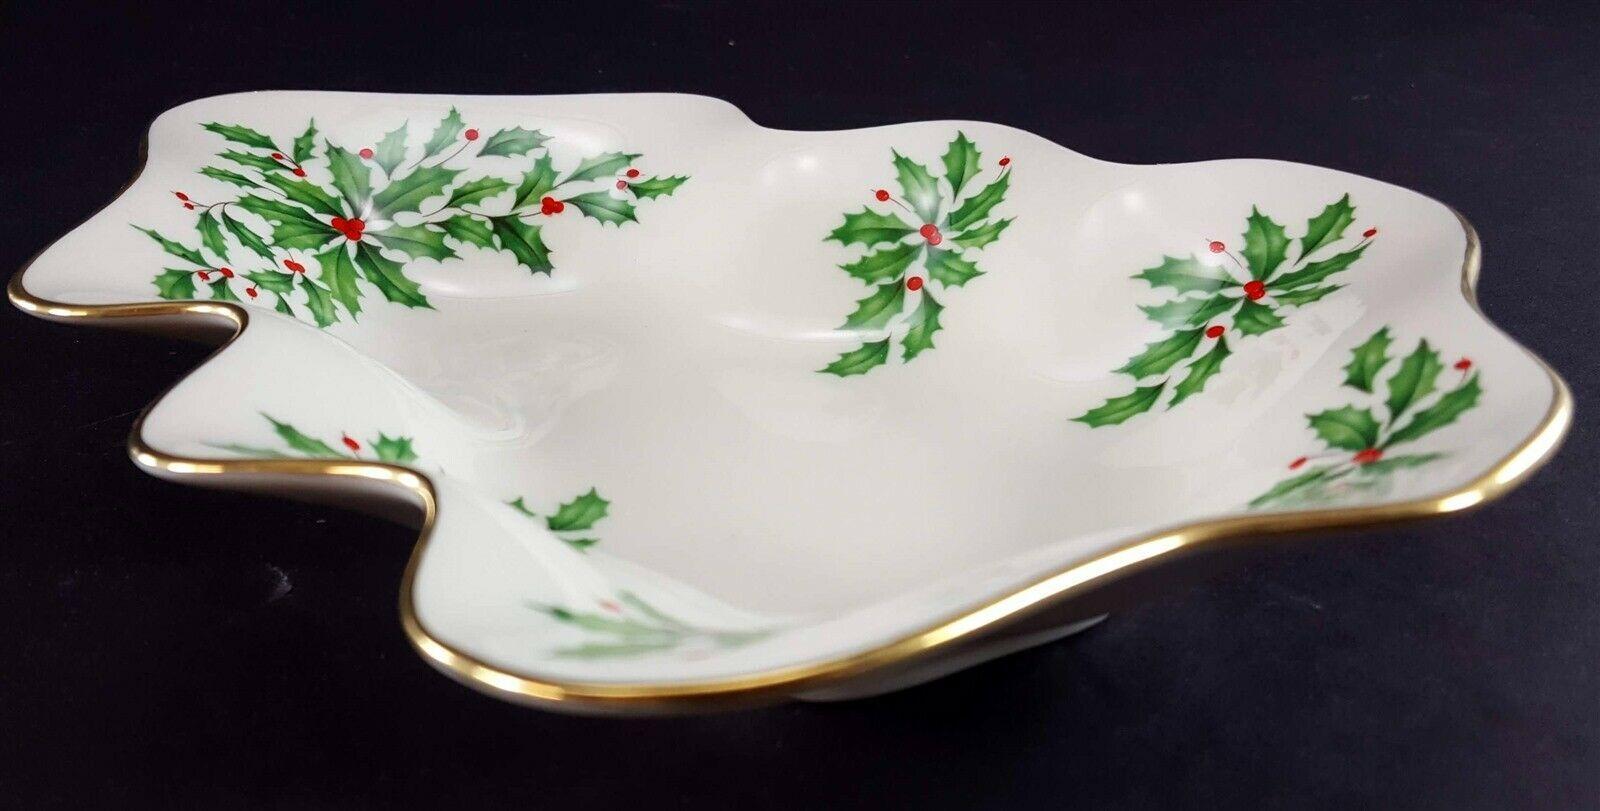 "LENOX China Holiday Dimension (Two) Tree Shaped Dish 8-3/4"" & 5-5/8"" Candy/Nuts"